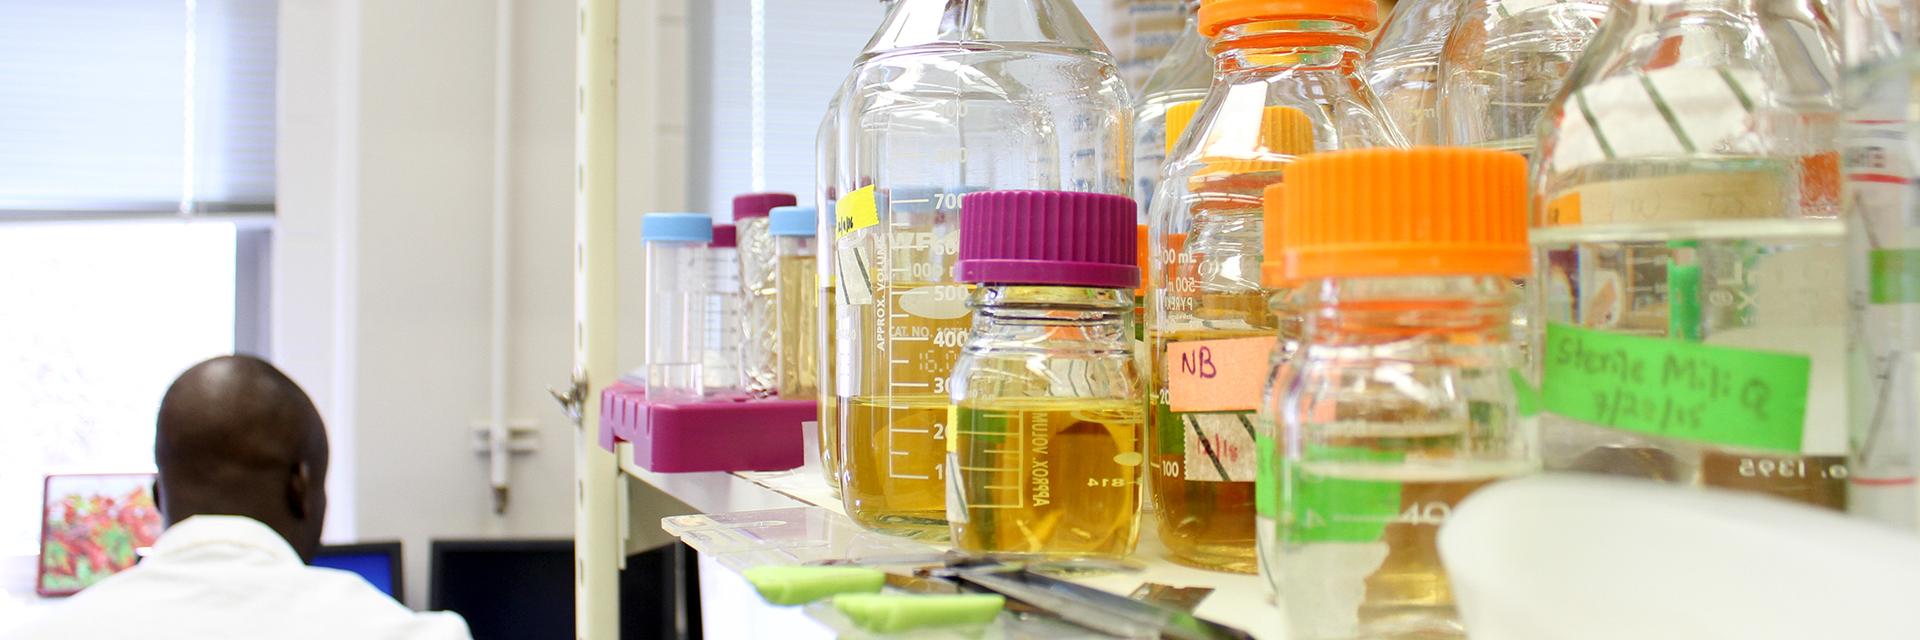 Entomology-Major-Researcher-in-Lab-Glass-Beakers-Viles-Fluids-sm